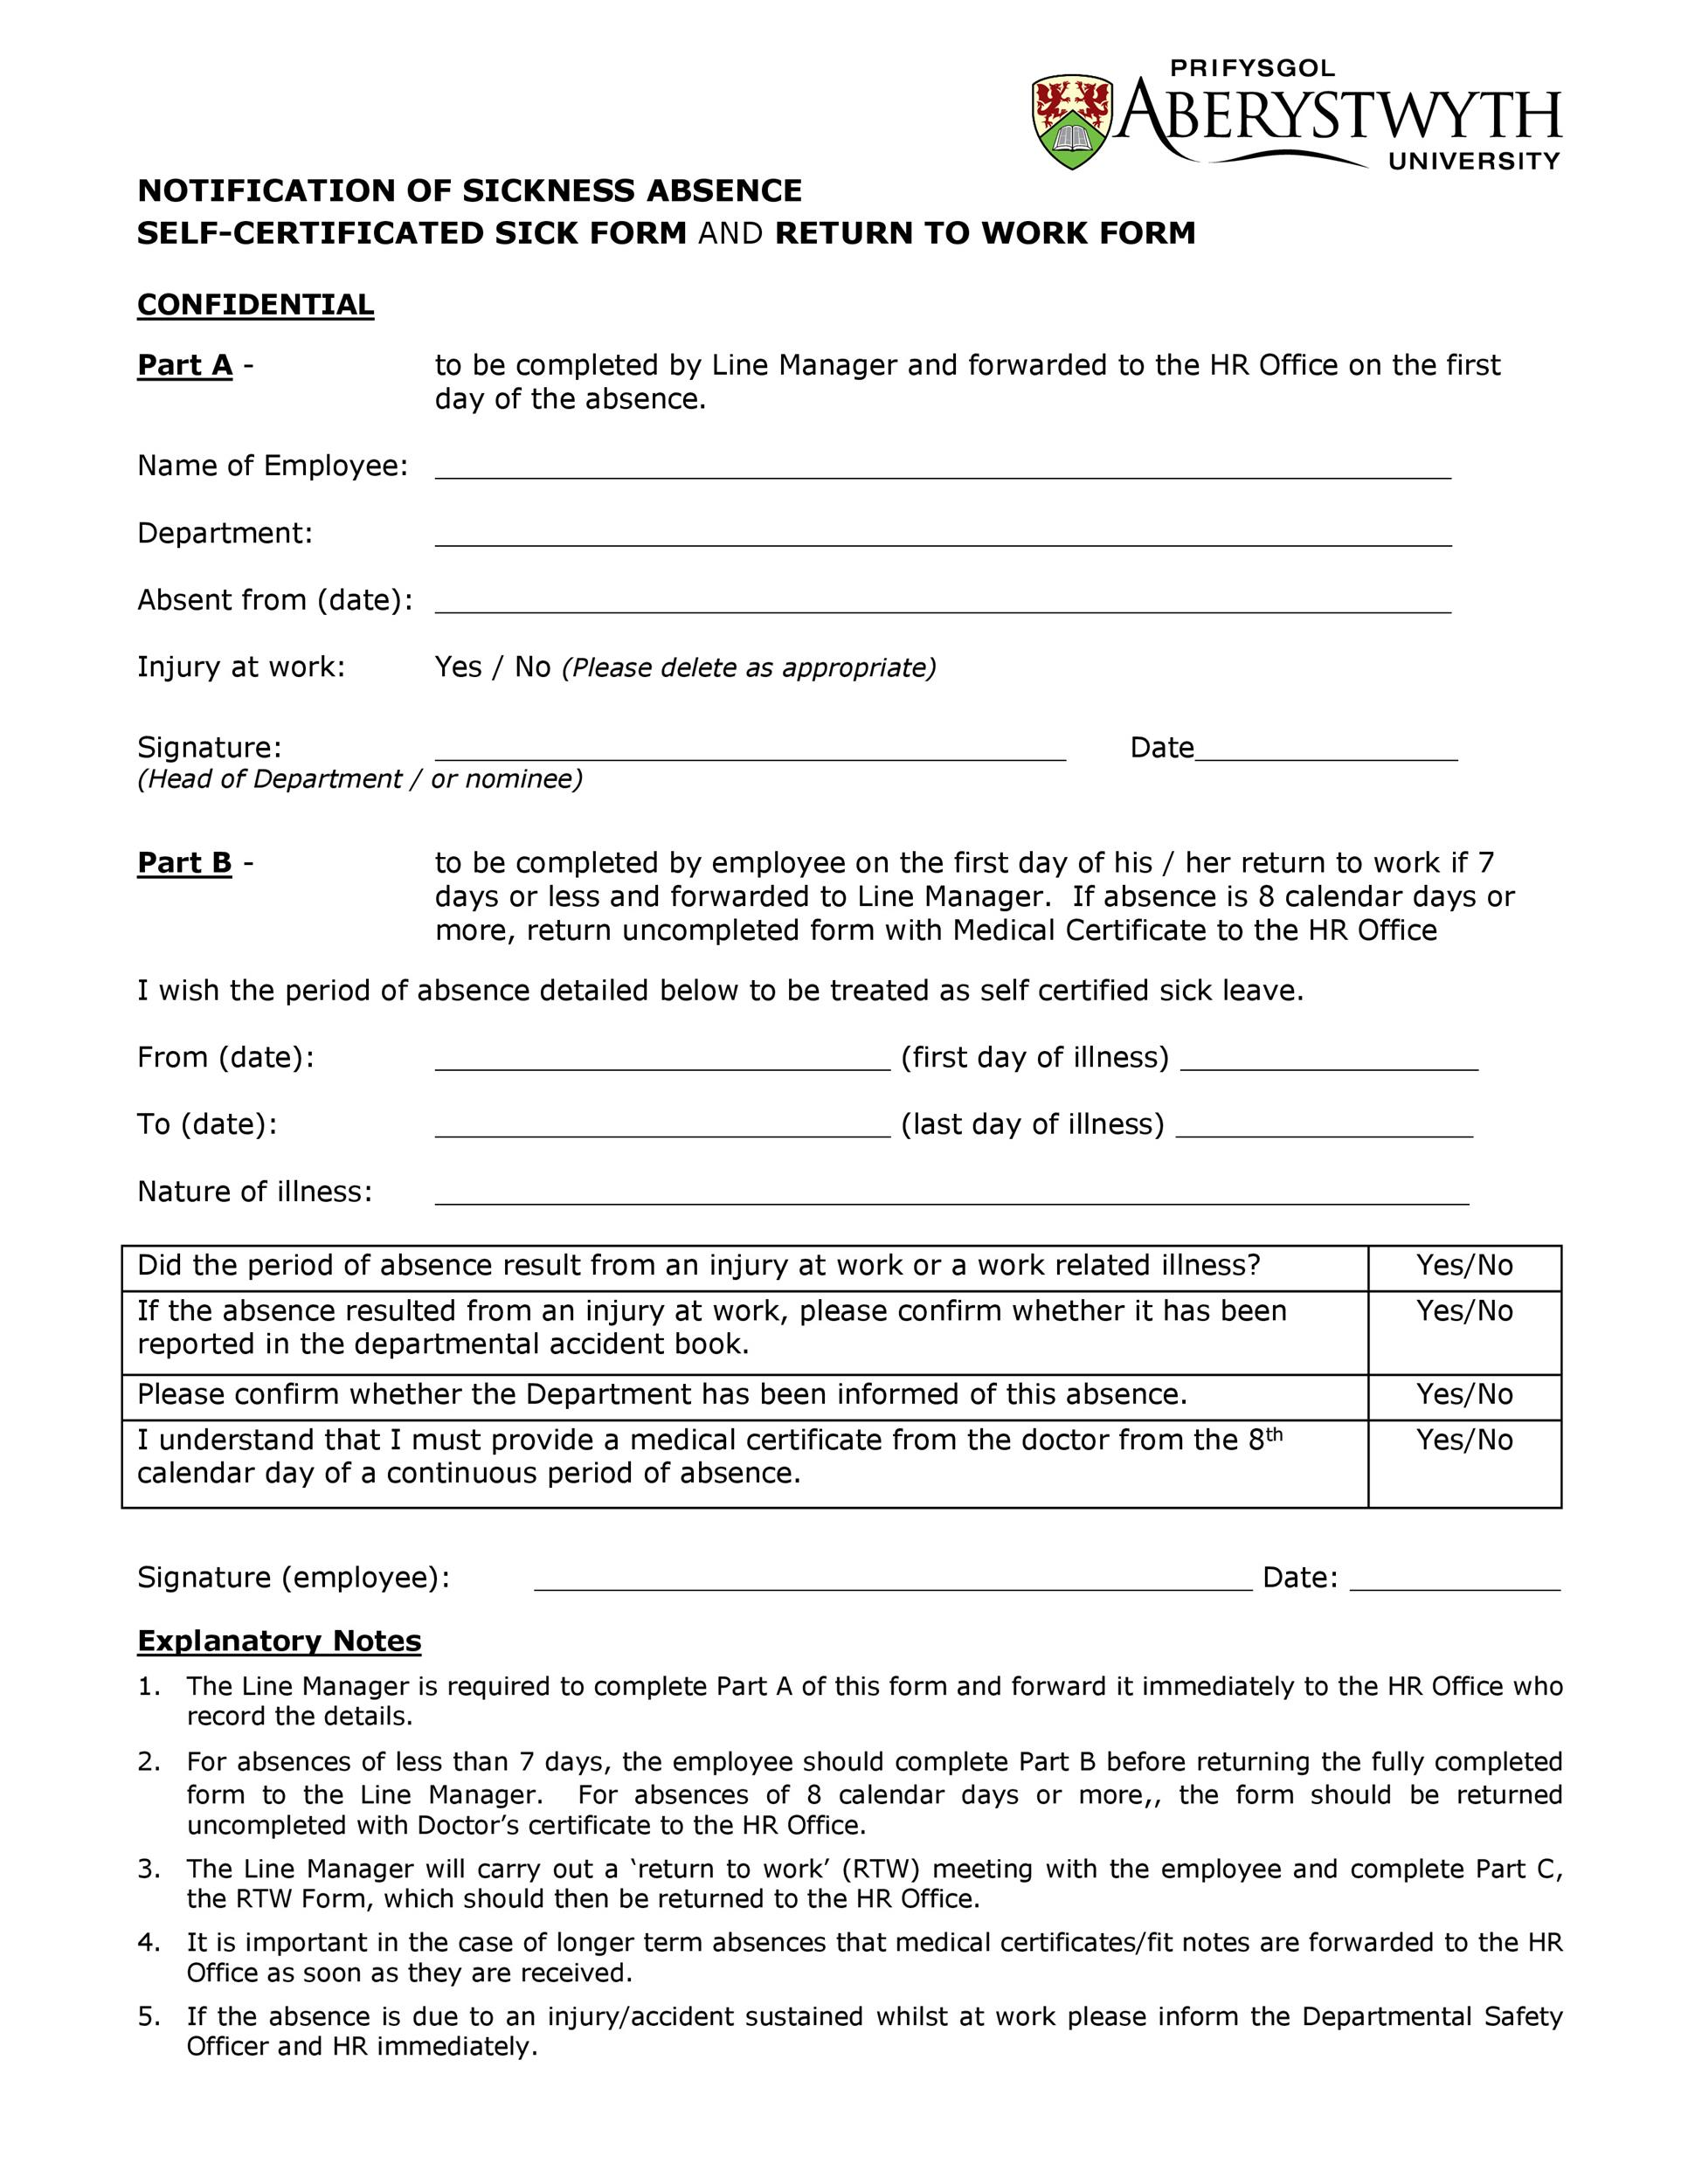 Free return to work form 21